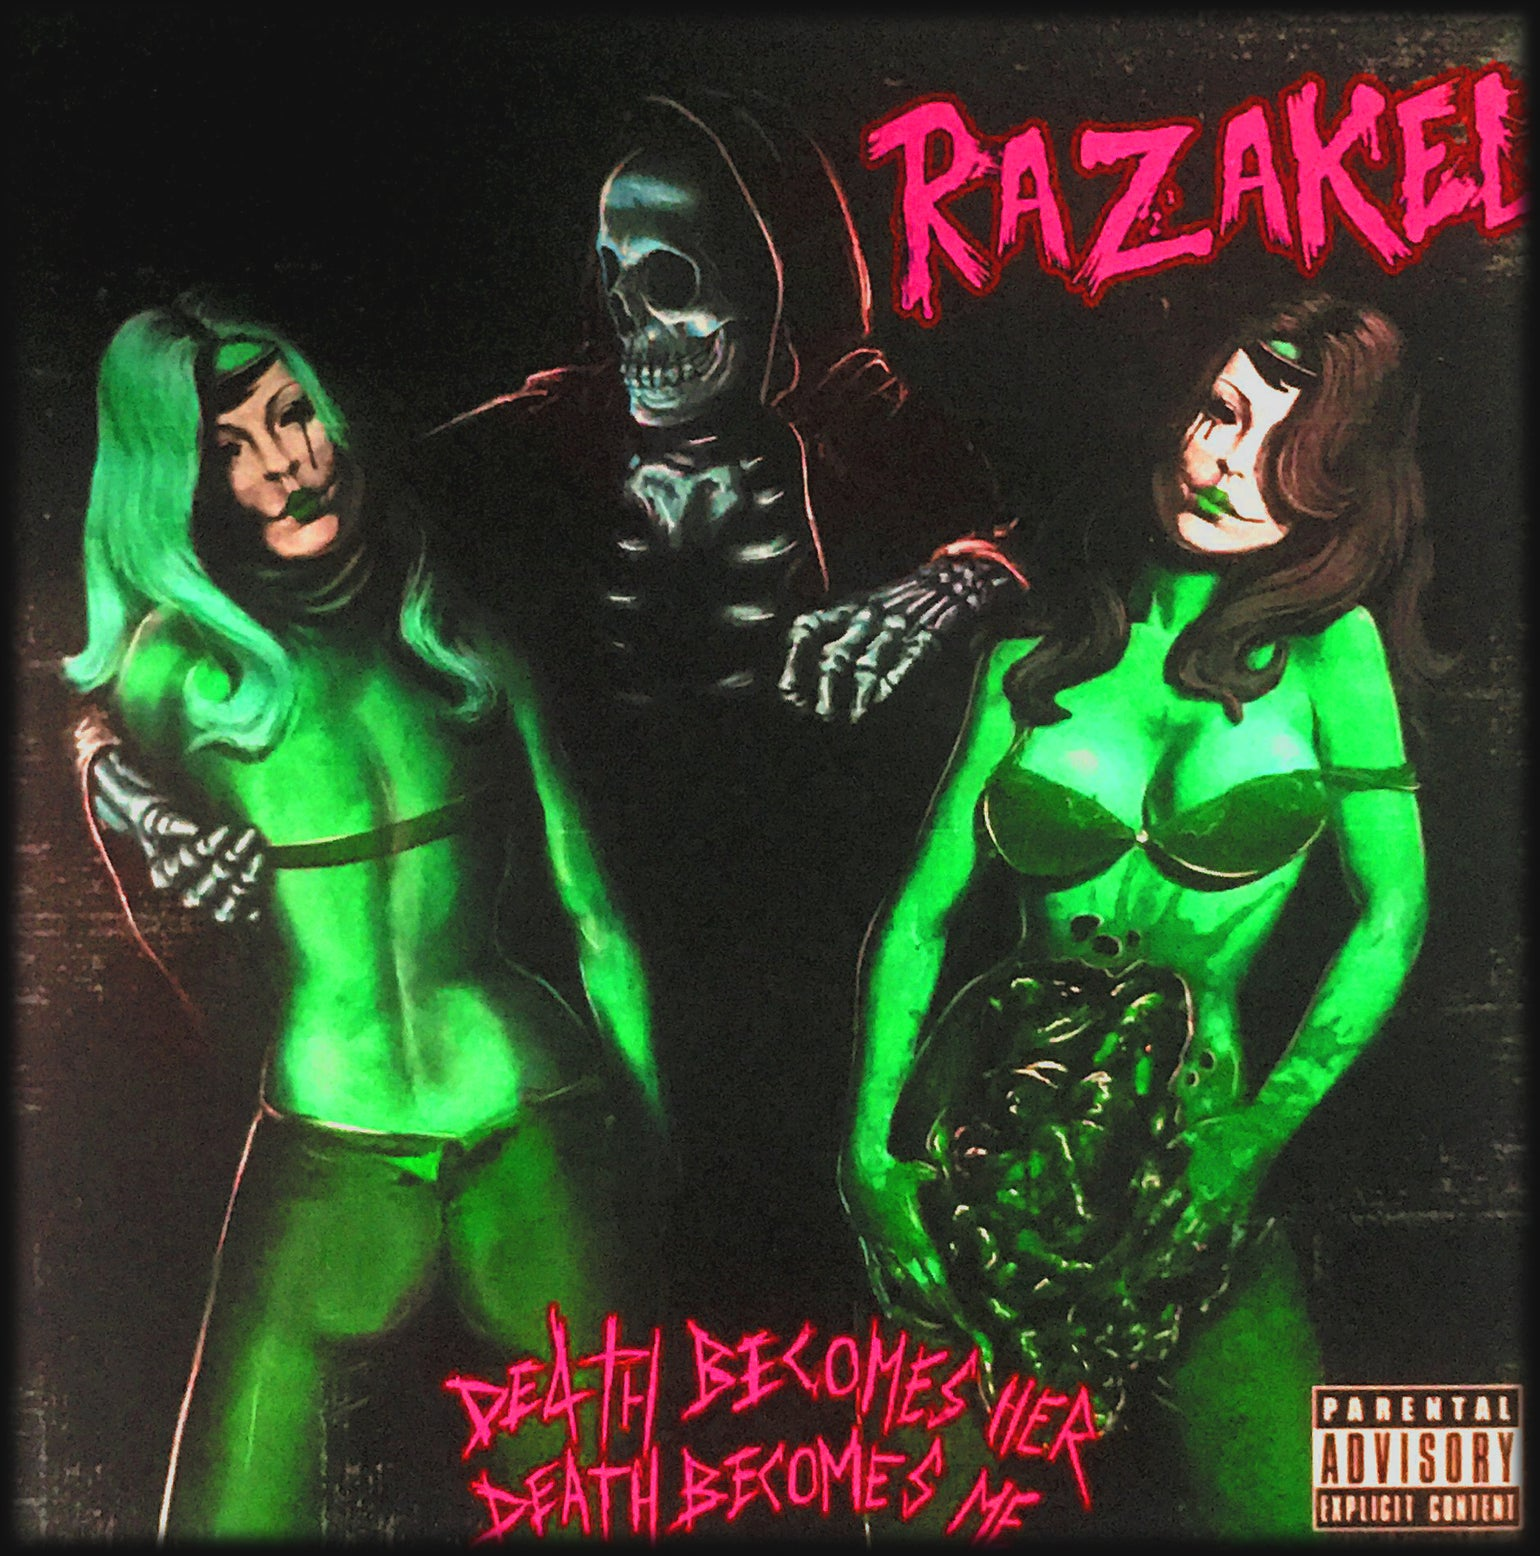 Image of Razakel - Death Becomes Her, Death Becomes Me CD